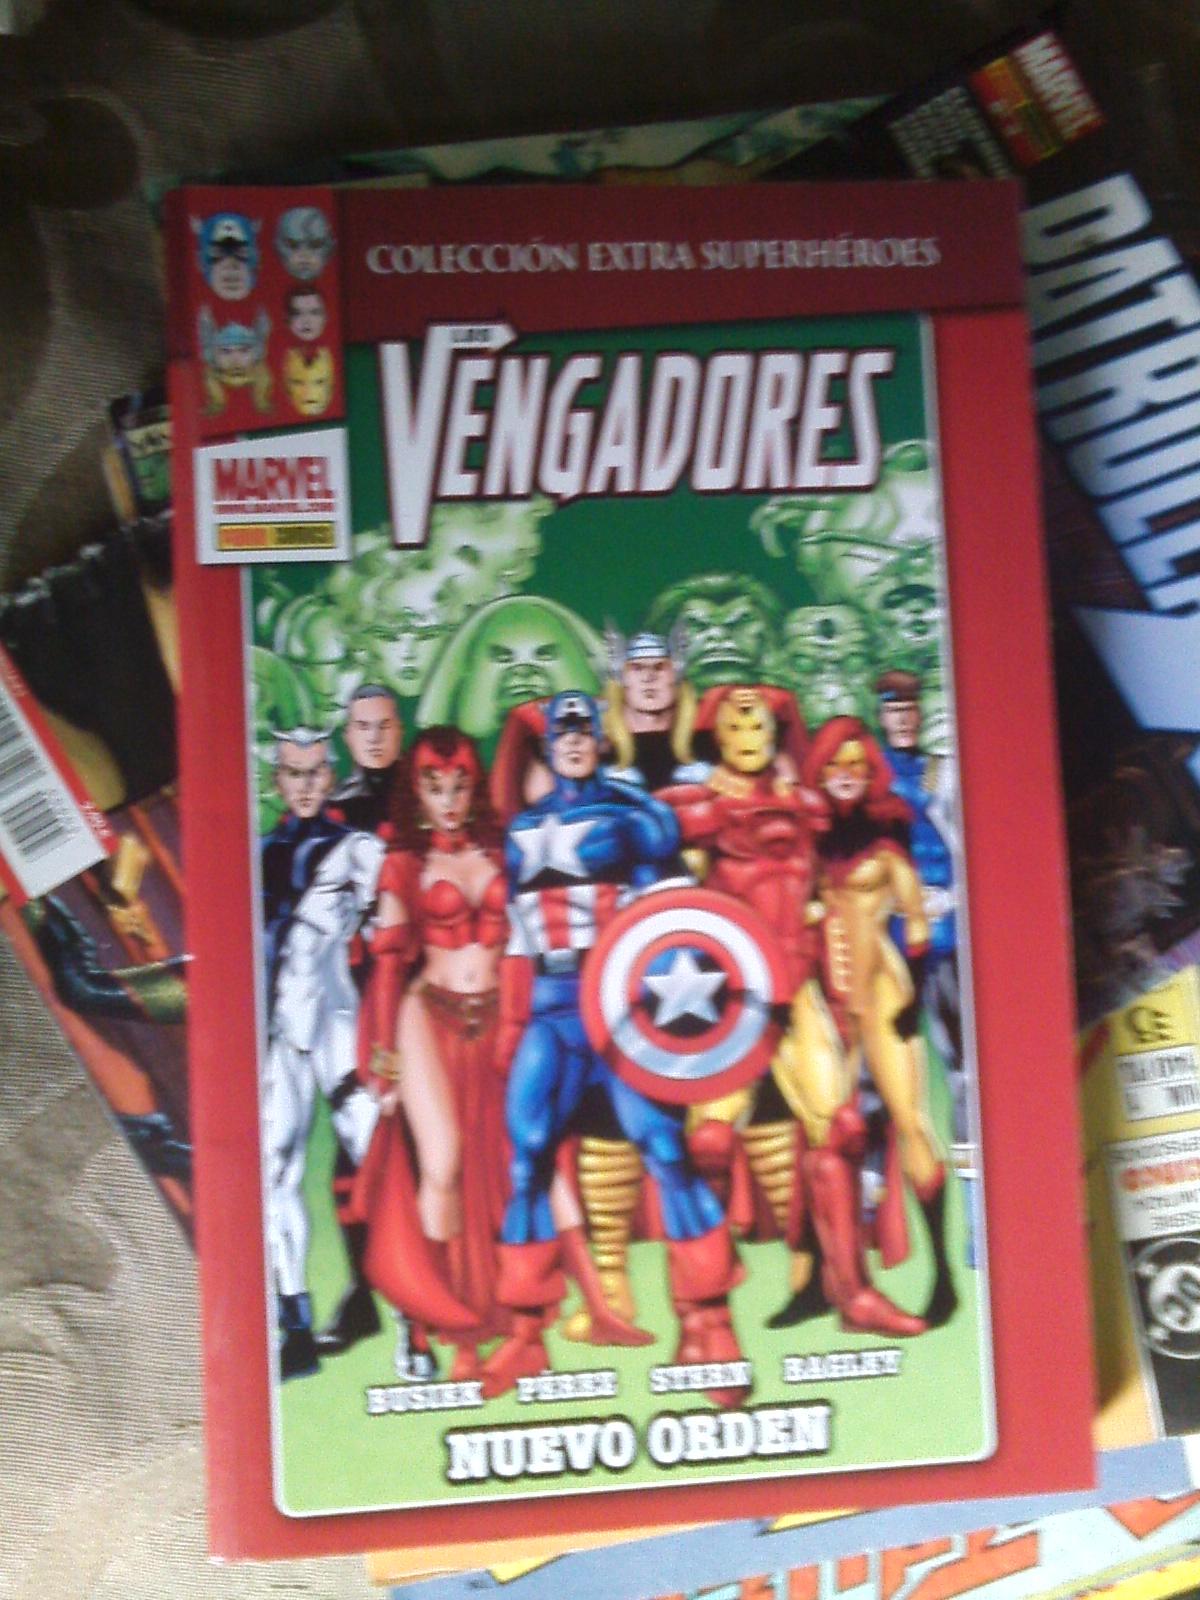 [Comics] Siguen las adquisiciones 2015 - Página 9 CAM05279